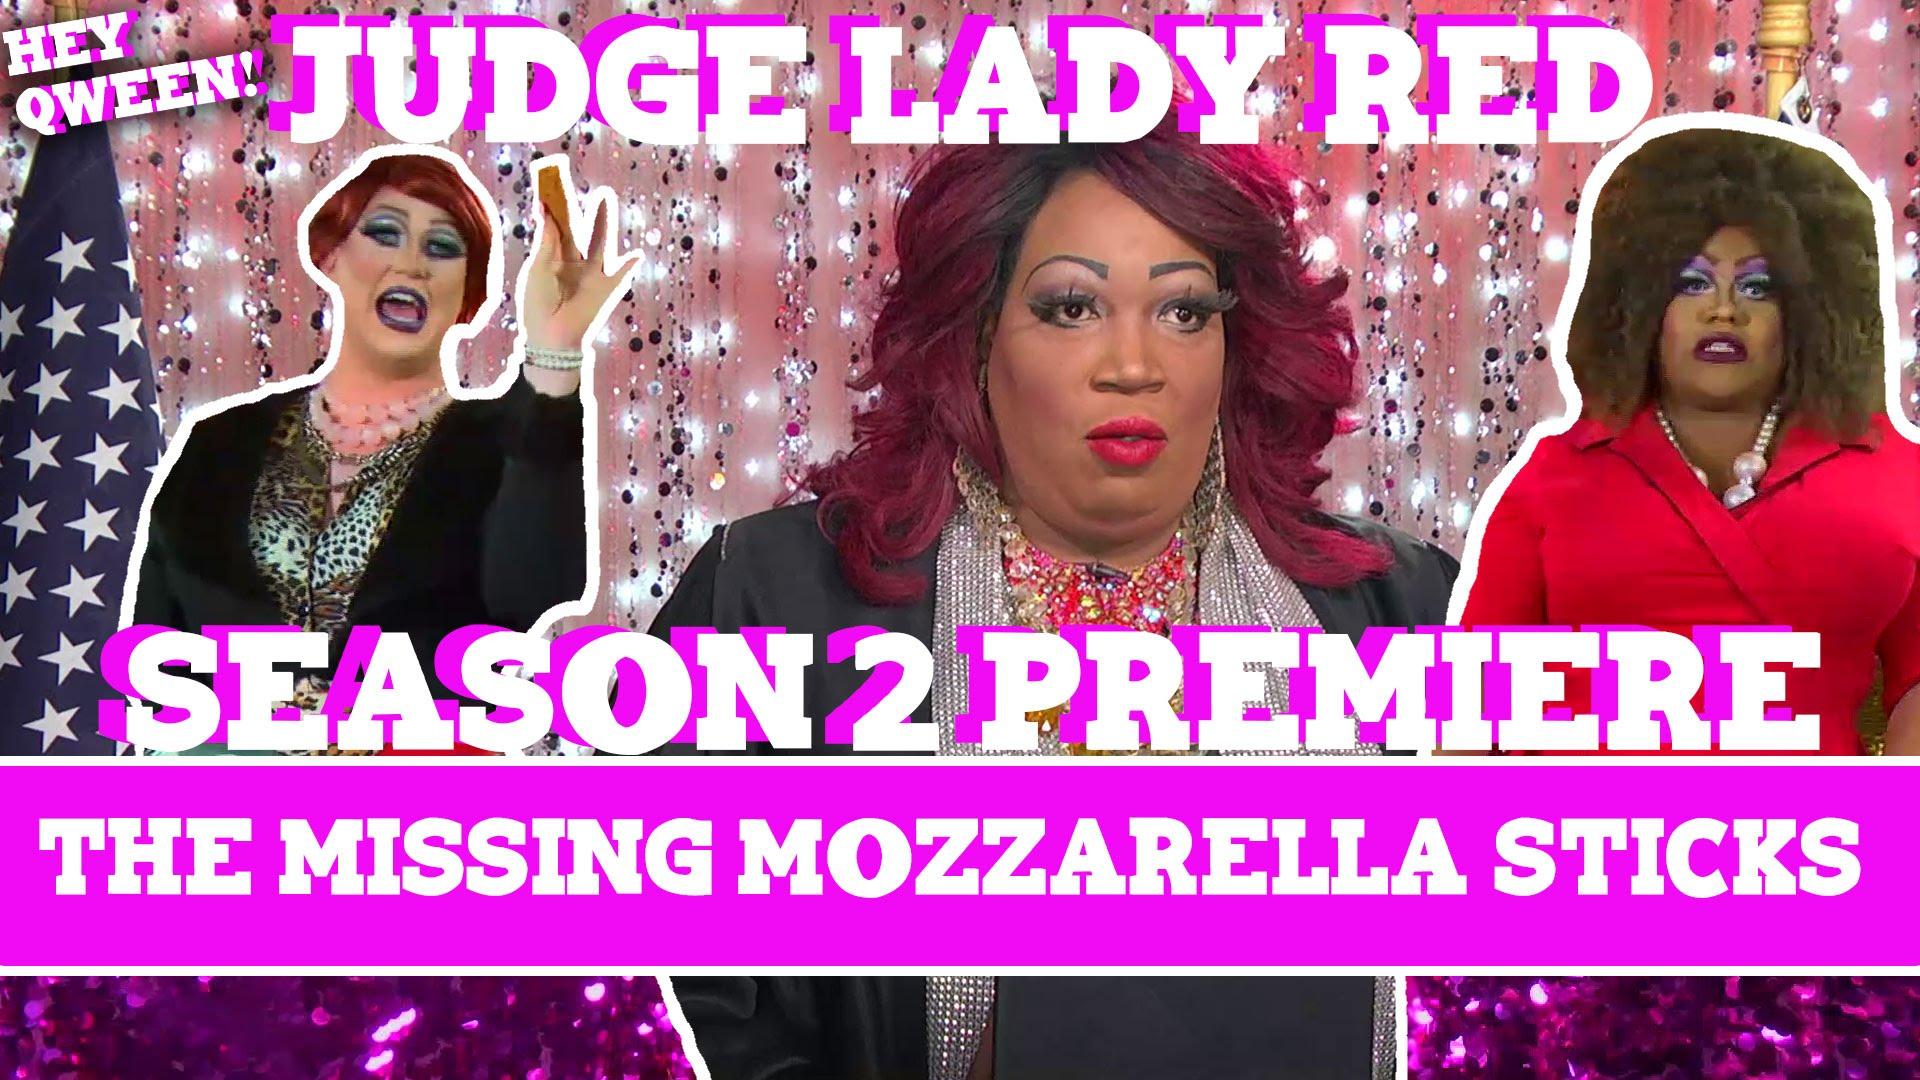 Judge Lady Red Season 2 Premiere: The Case Of The Missing Mozzarella Sticks